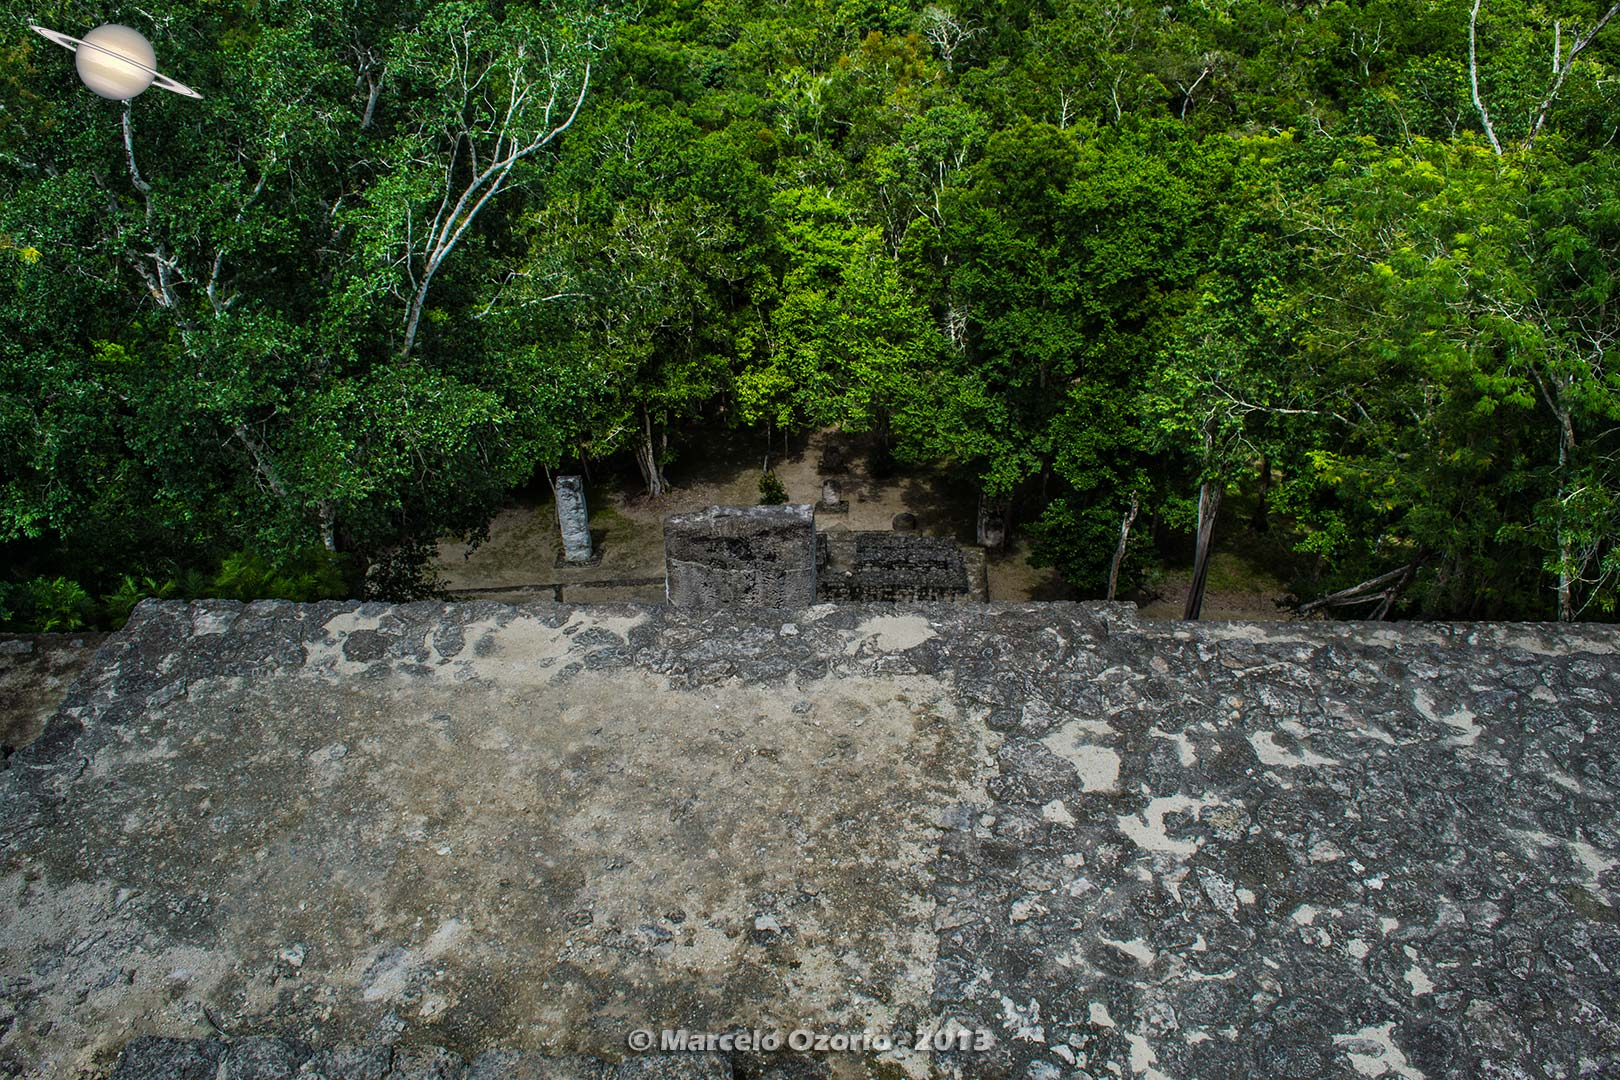 calakmul mayan civilization mexico 32 - Calakmul, City of the Two Adjacent Pyramids - Mexico